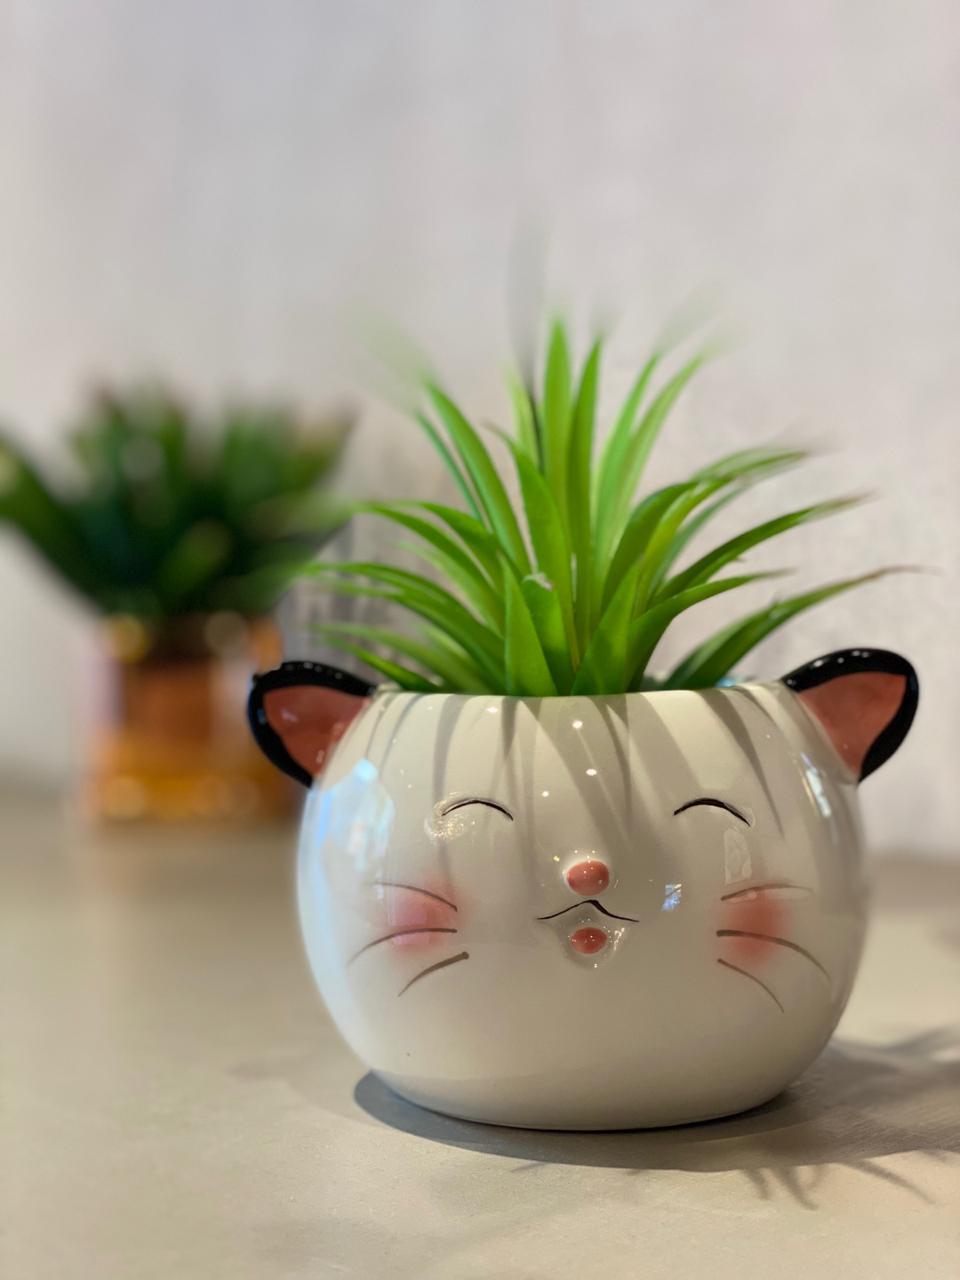 Vaso Decorativo Pets Colection: Gato - La Fleur